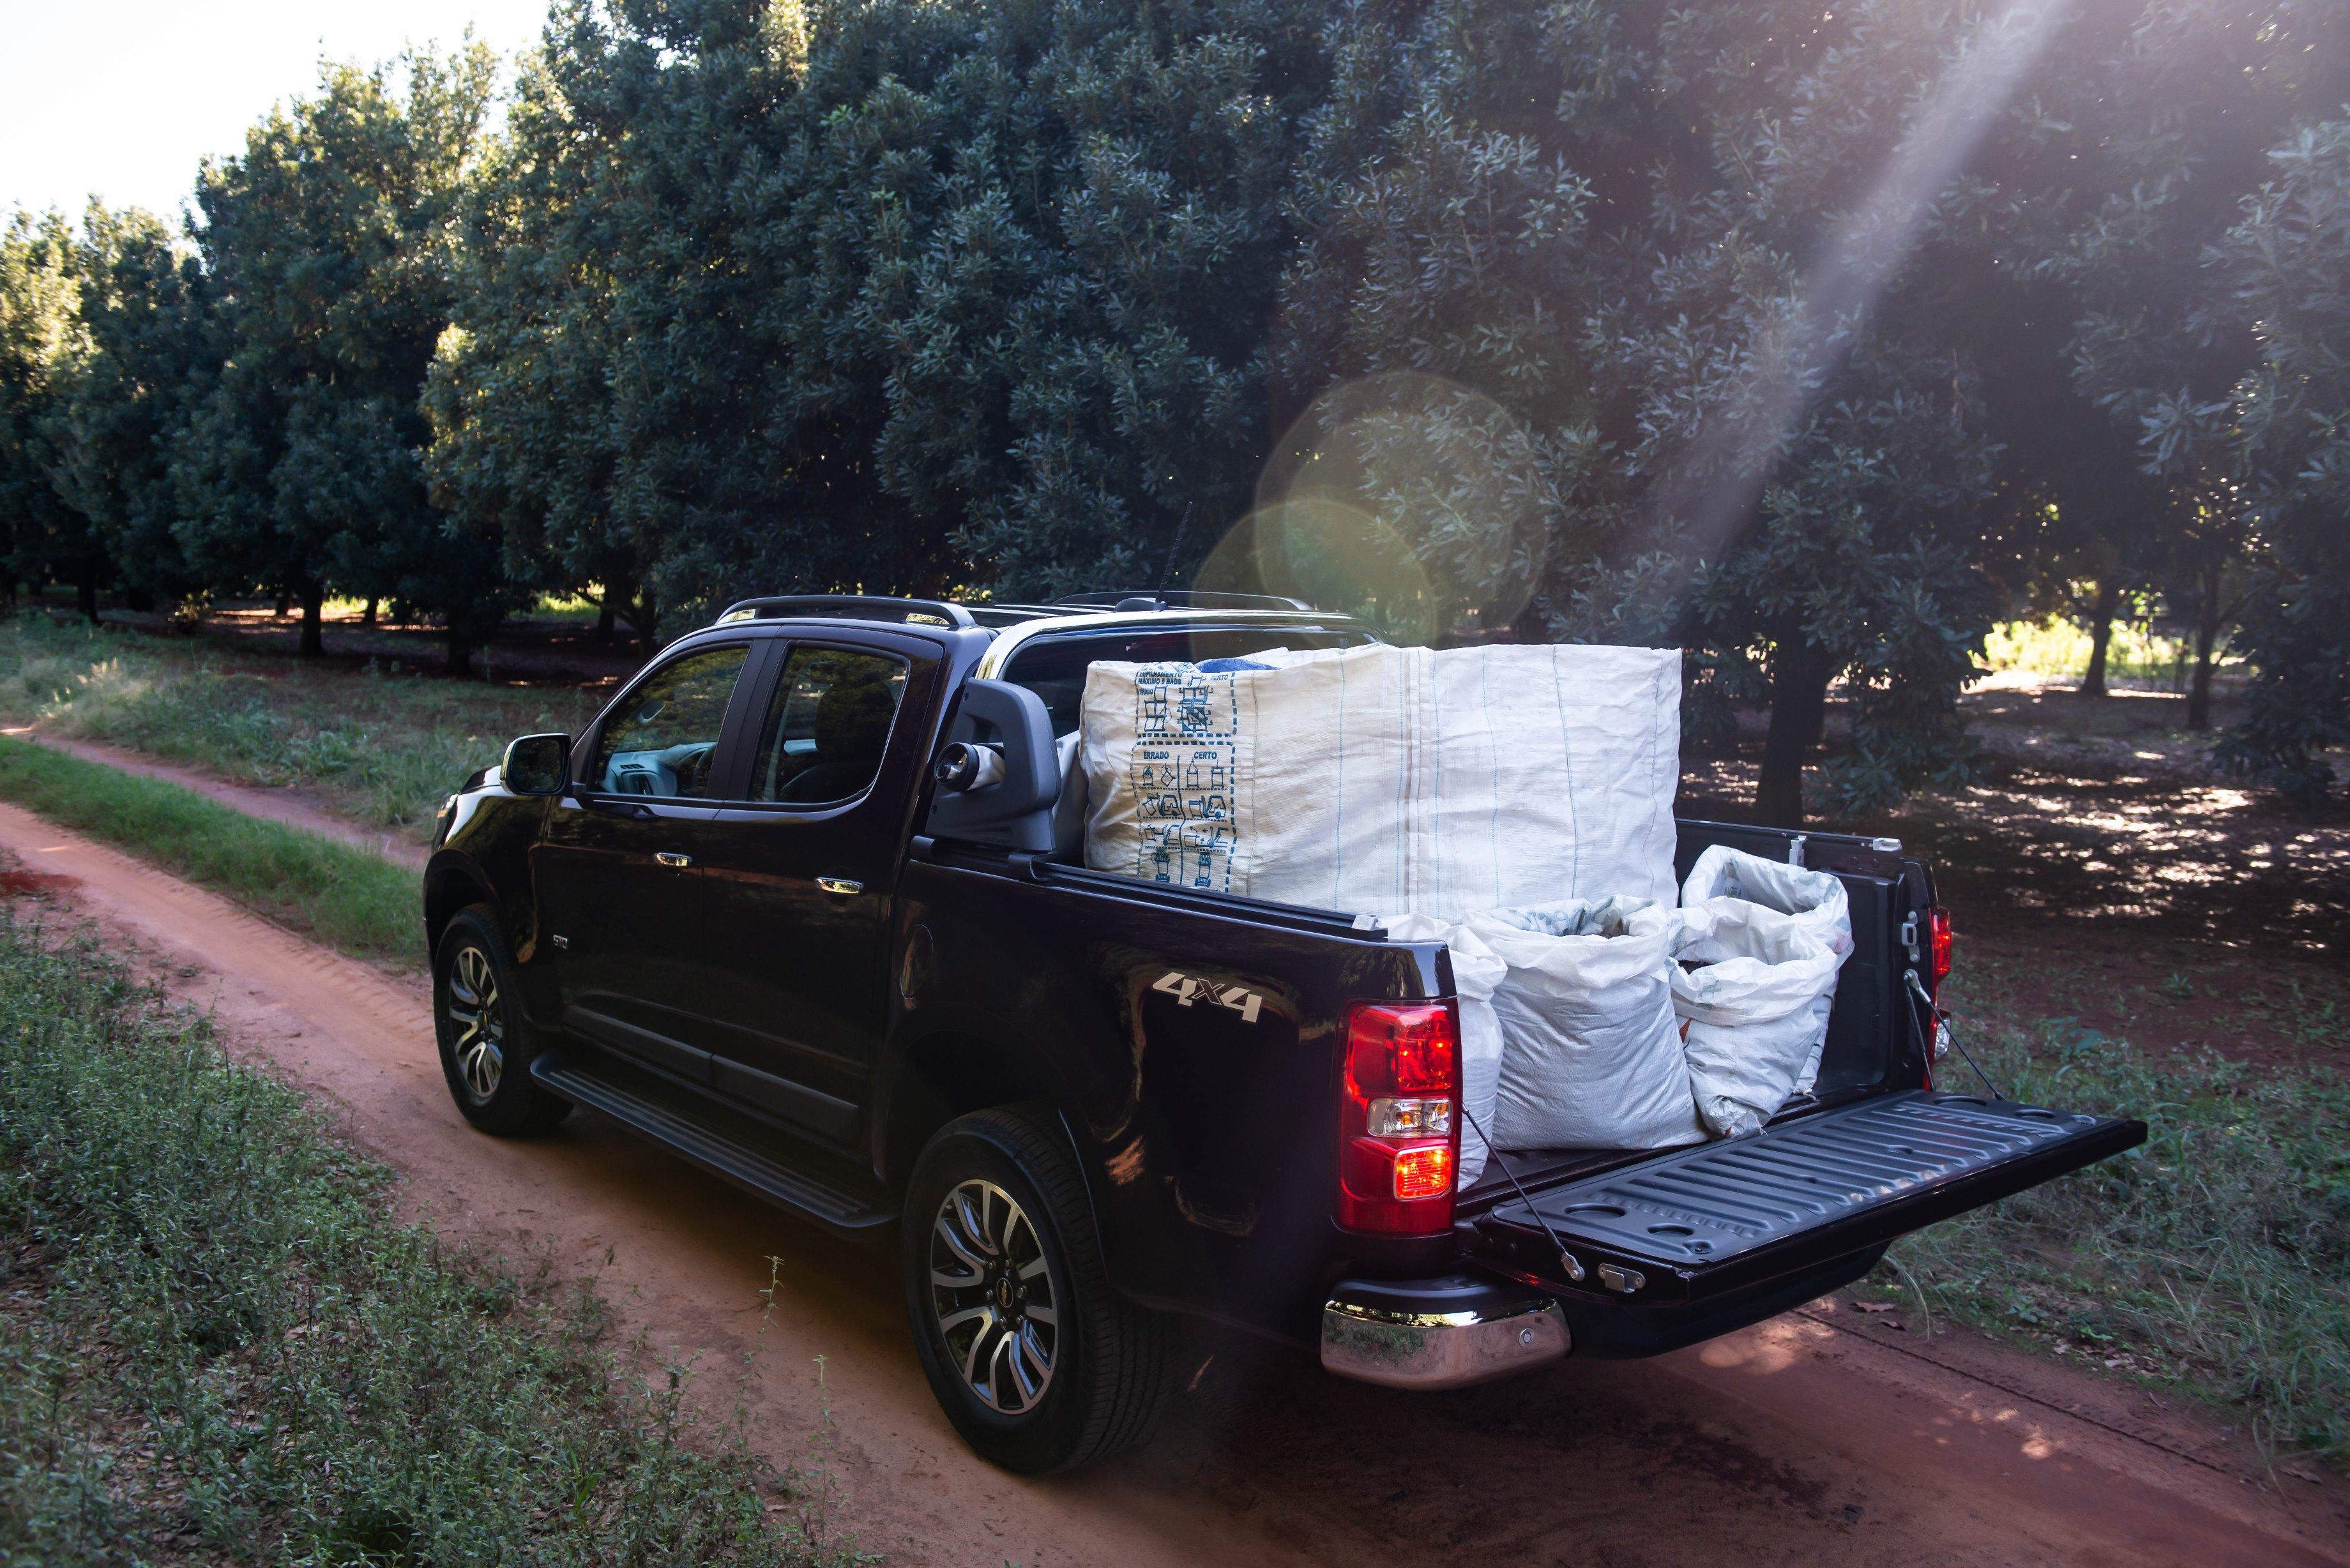 2021 chevrolet s10 pickup truck revealed, it's the